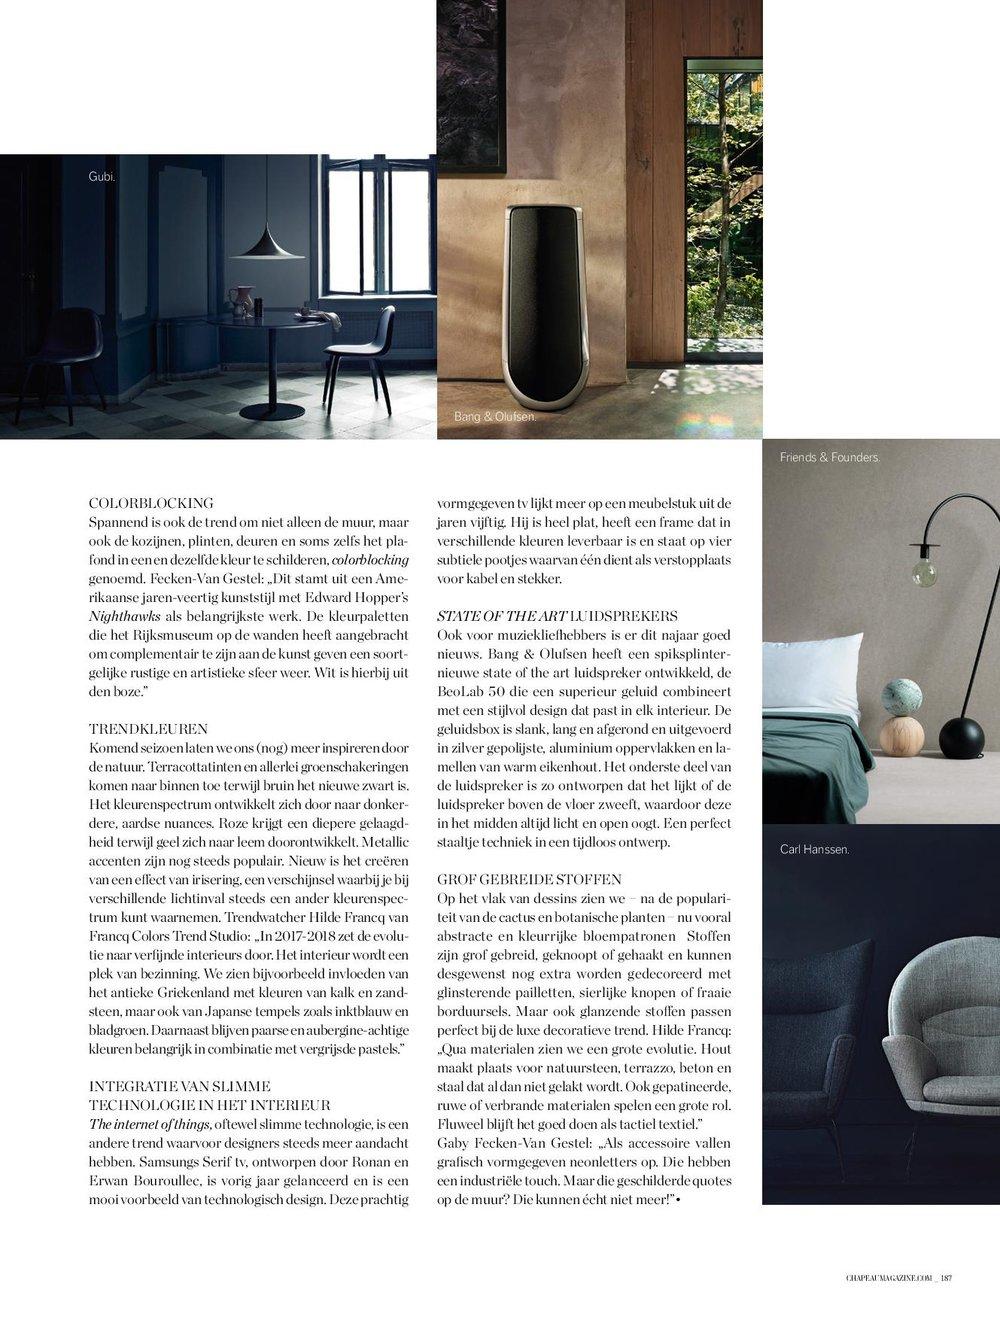 ChapeauMagazineNr5 2017 187-page-001.jpg